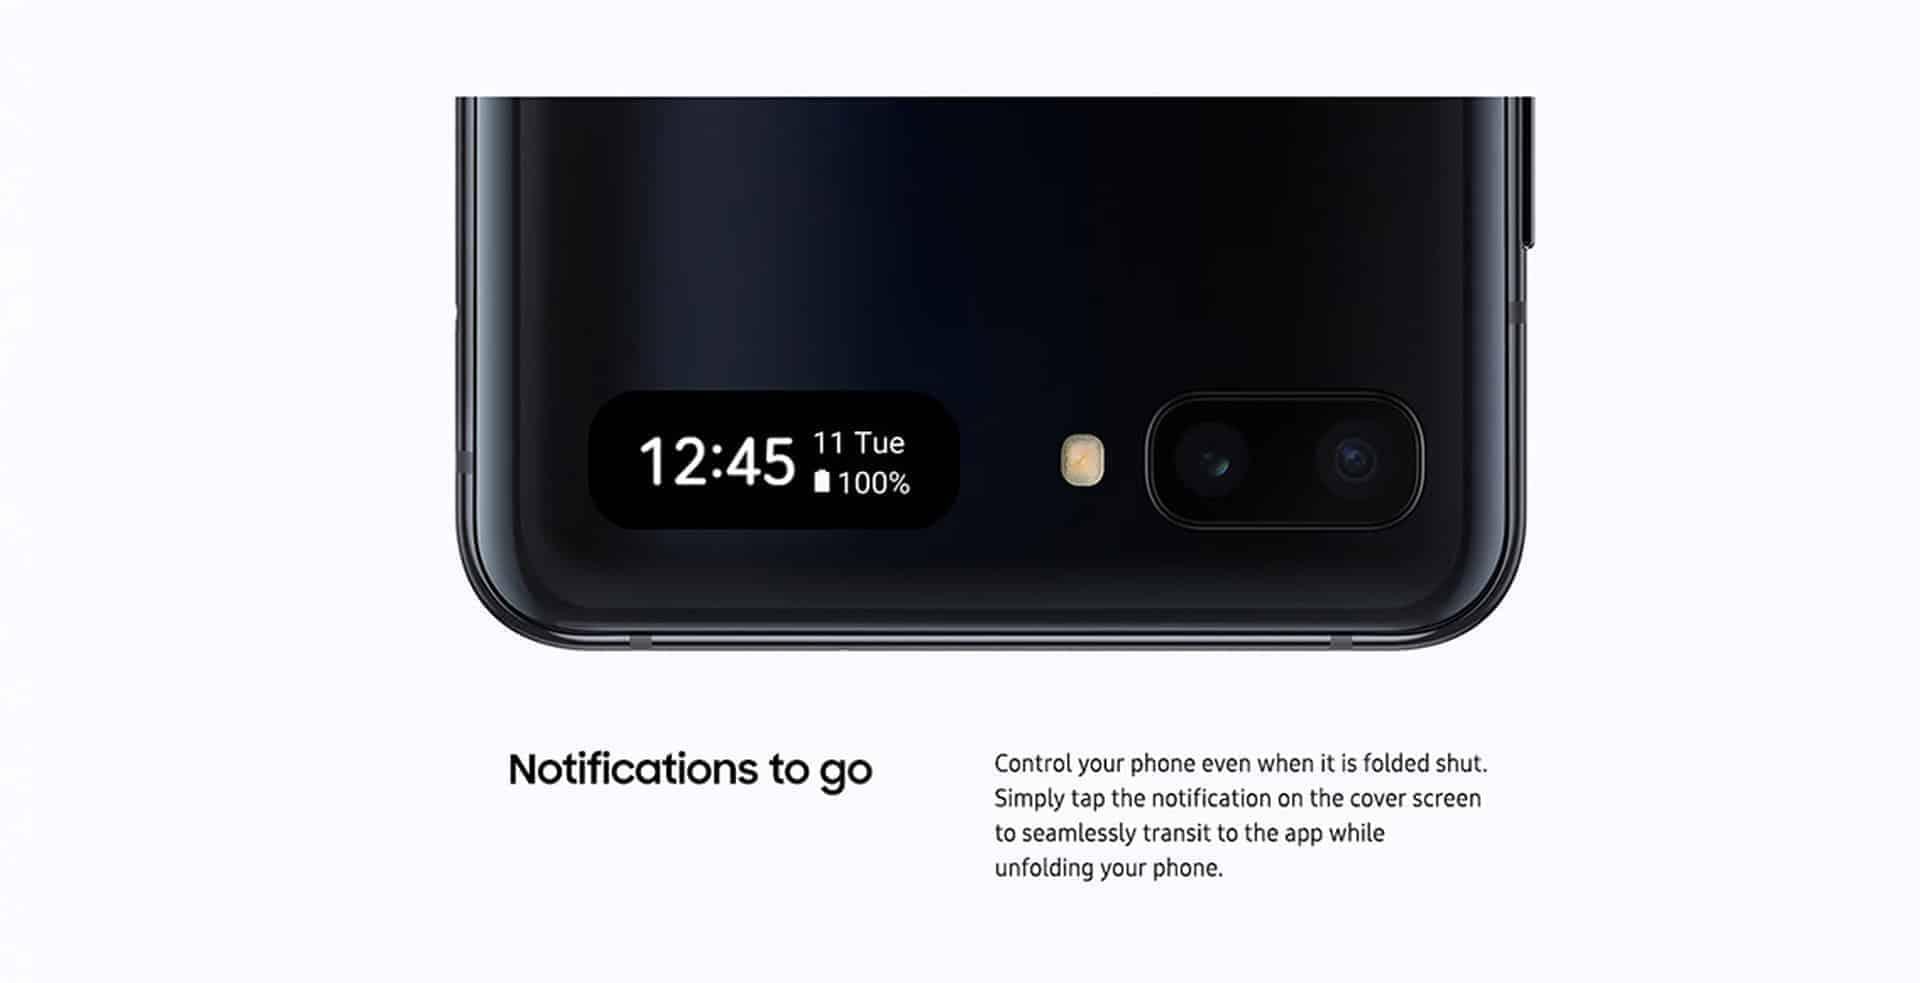 Samsung Galaxy Z Flip marketing image 2